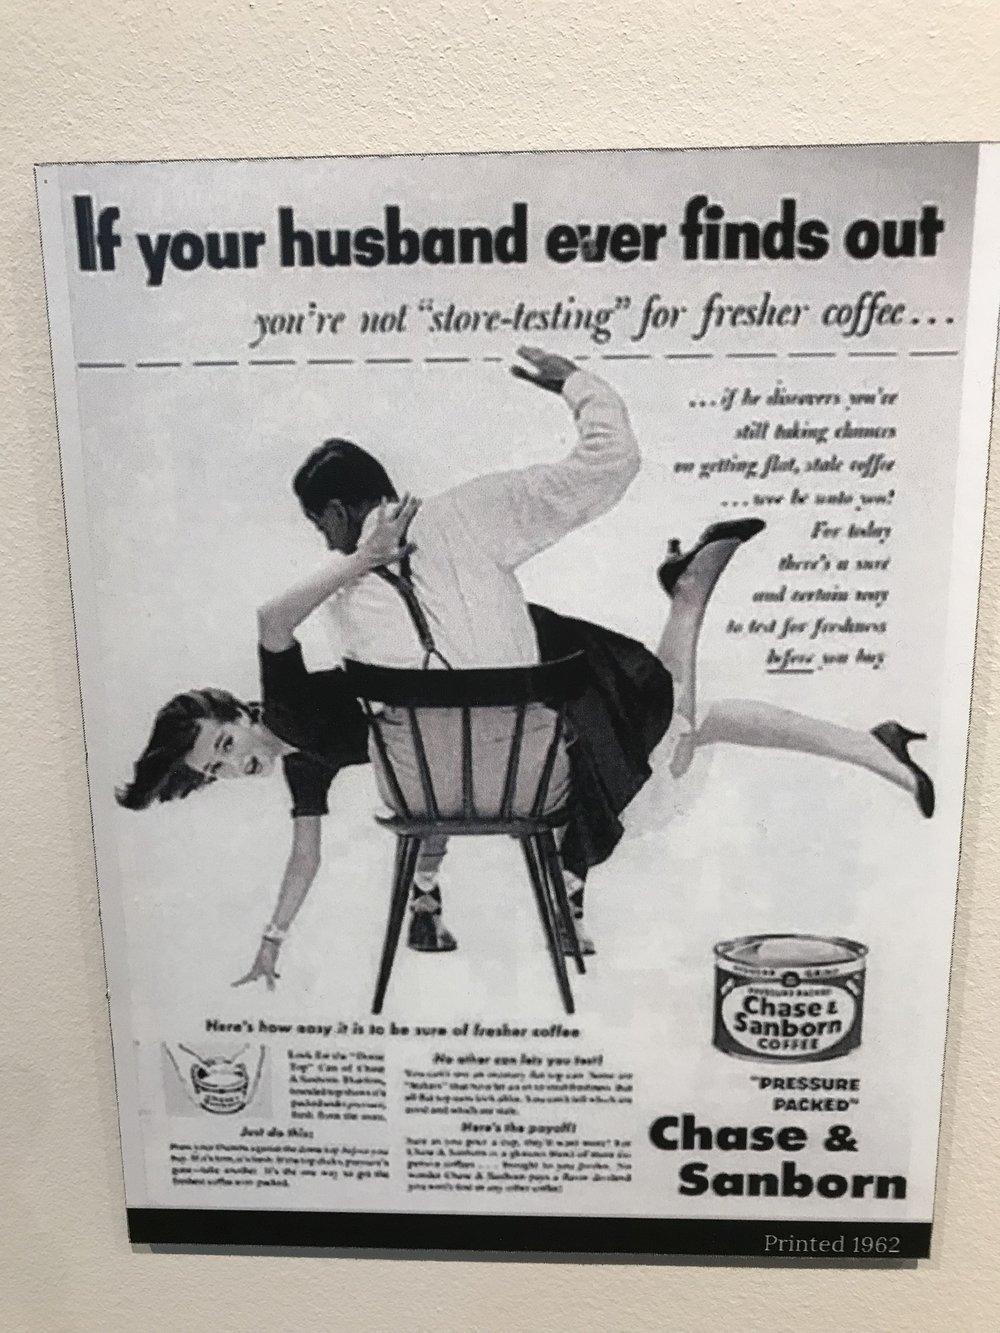 Spanking advertisement - aSHEville museum